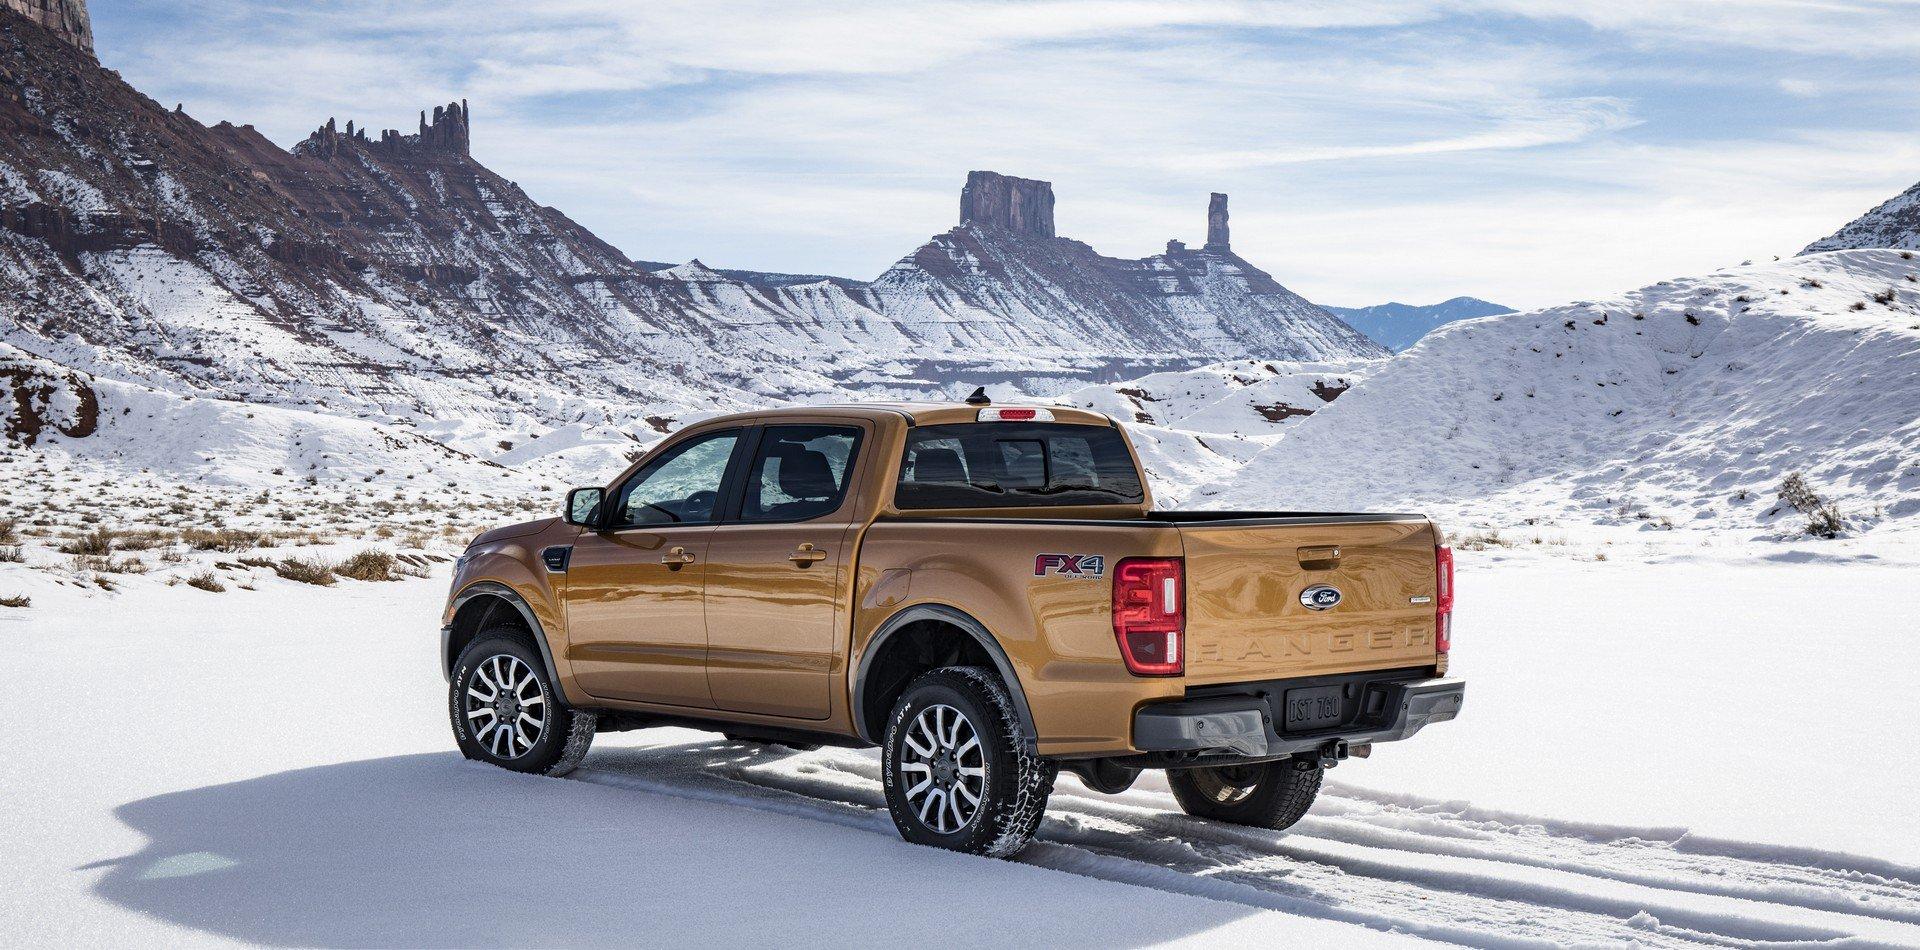 Ford-Ranger-2019-co-gia-tu-567-trieu-dong-anh-2